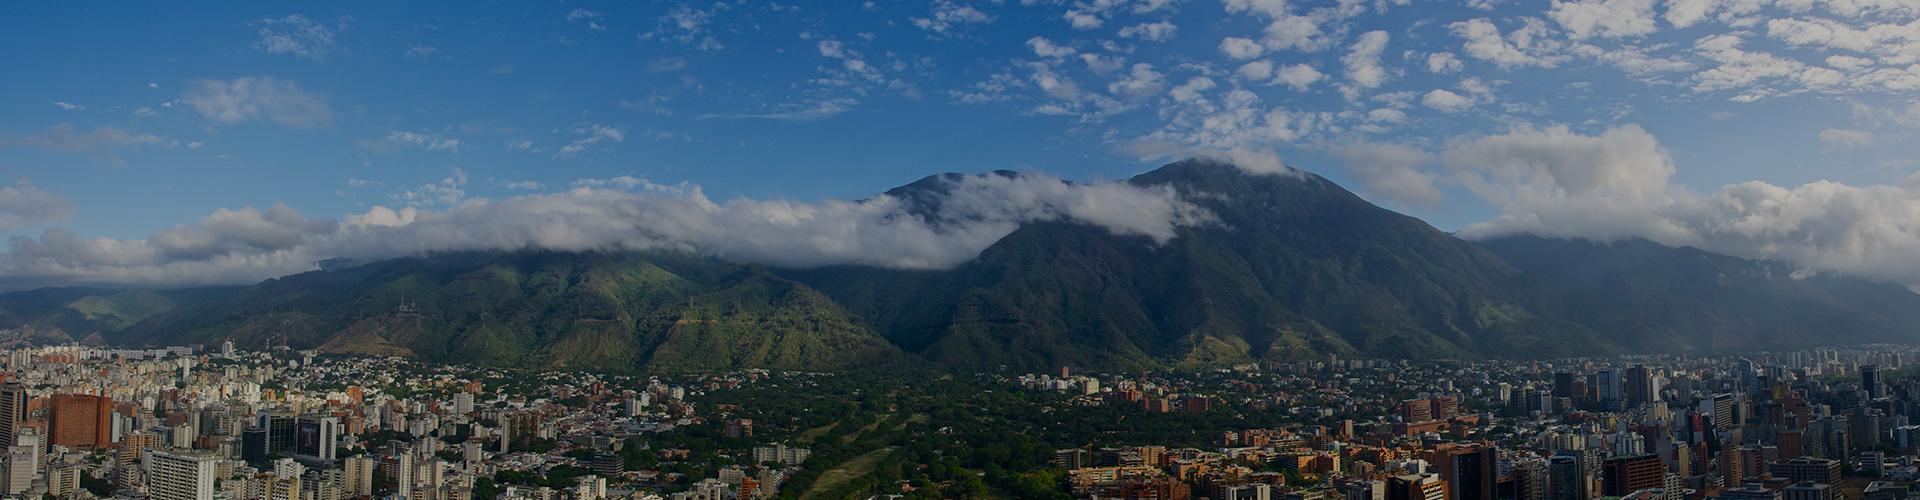 Landmark photograph of Venezuela